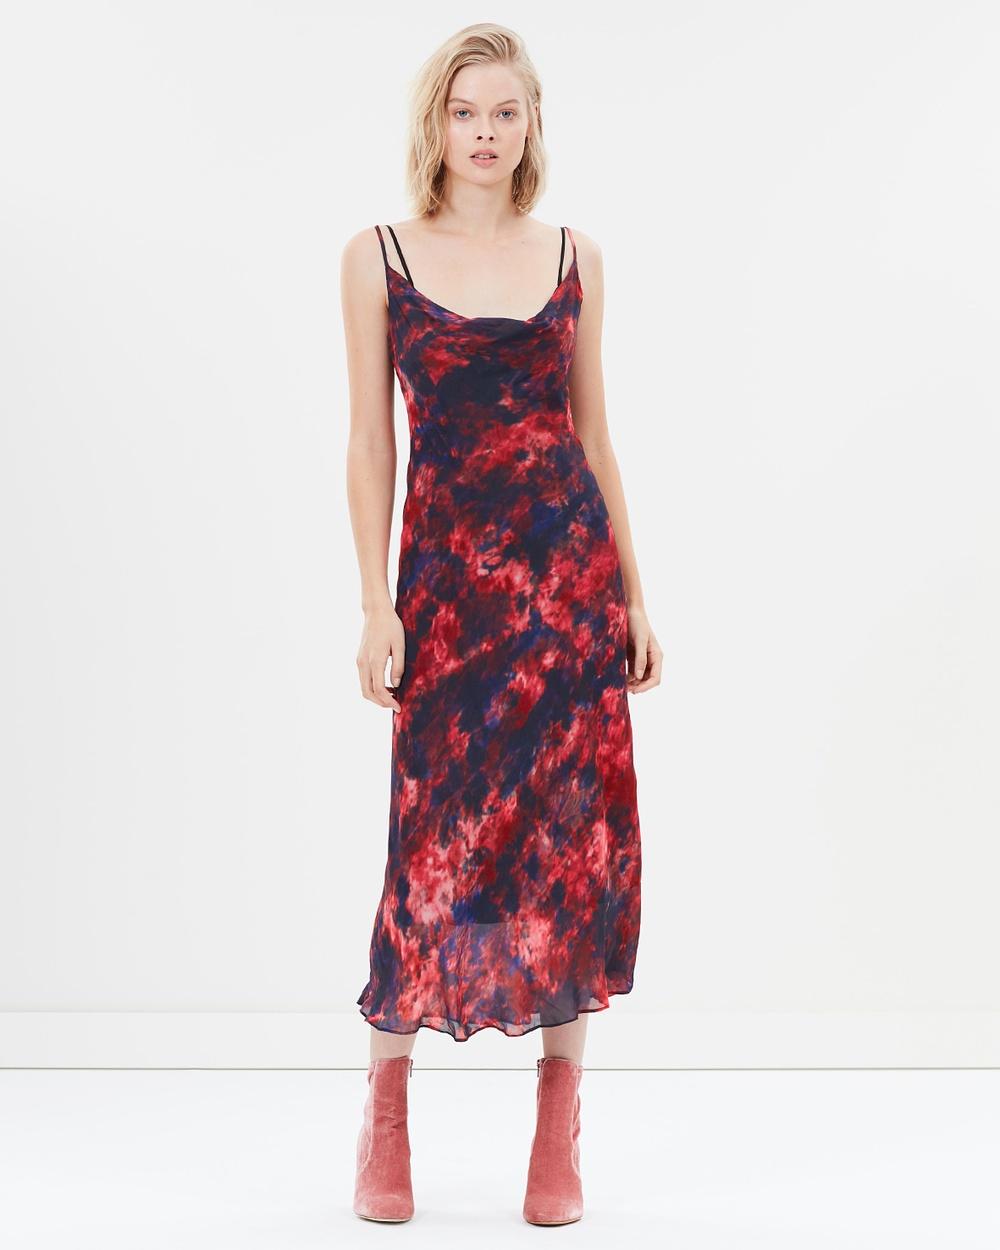 Hansen & Gretel Milena Dress Printed Dresses Tie Dye Milena Dress